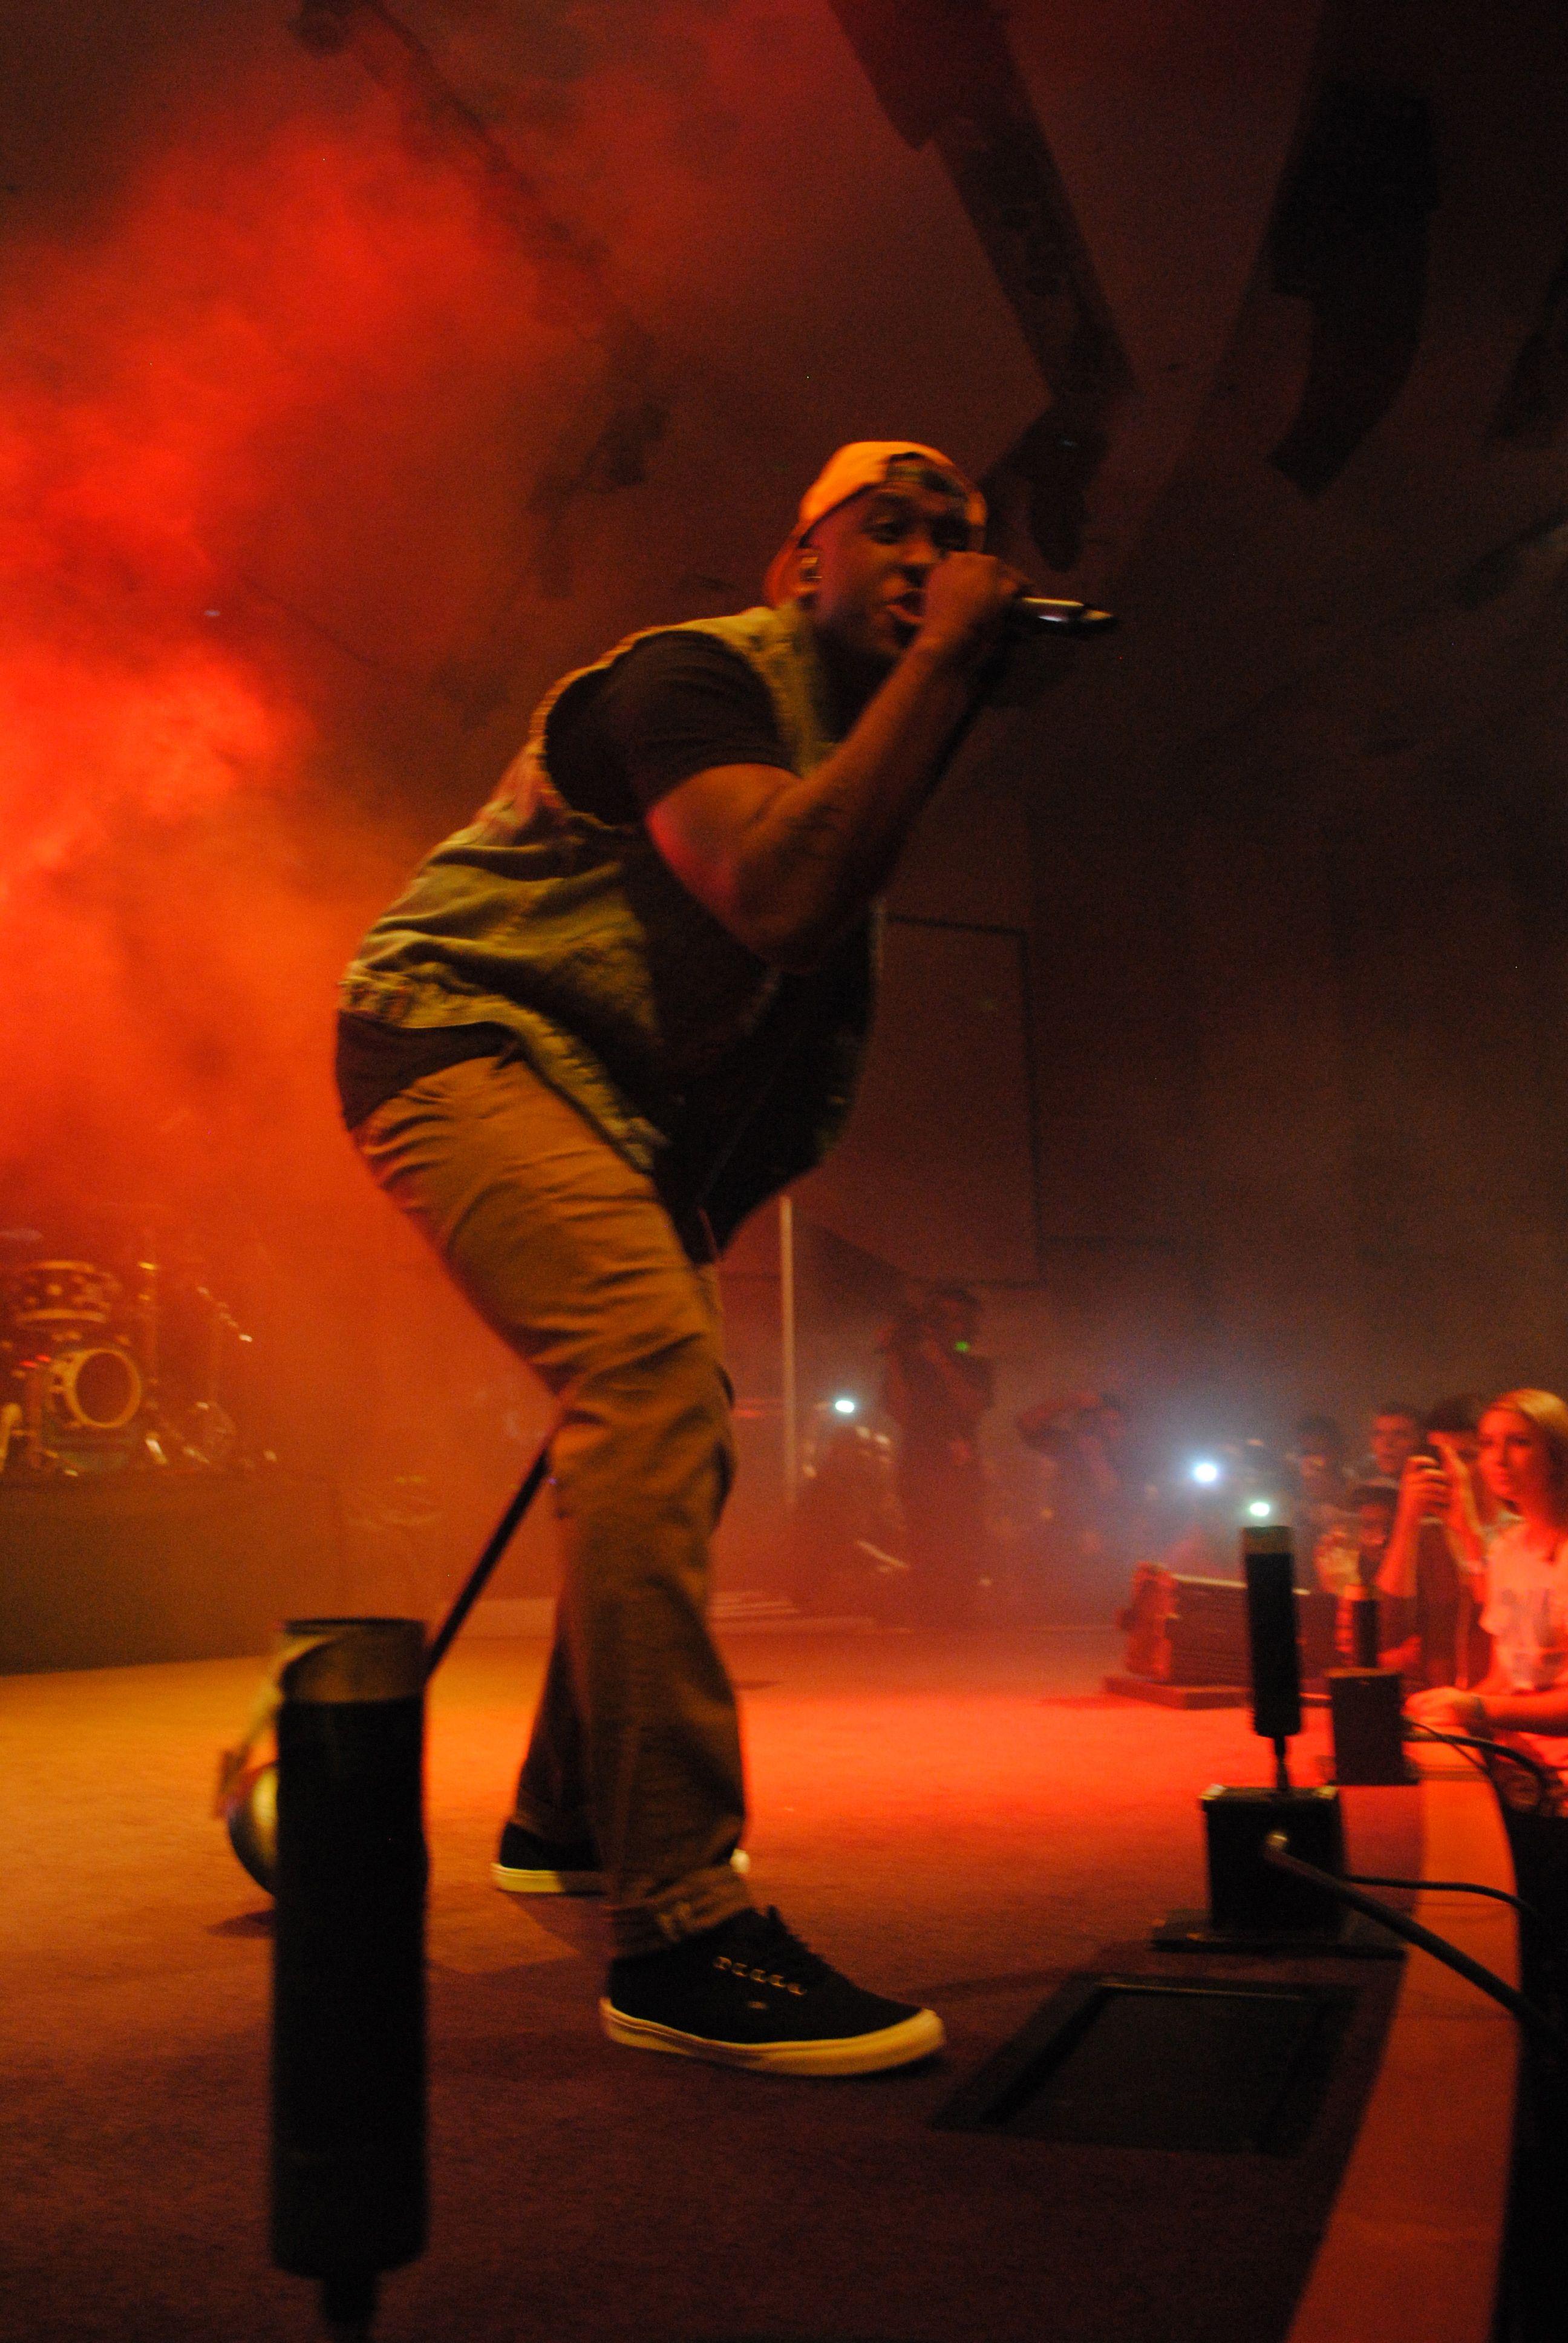 Derek minor christian rappers christian rap music people